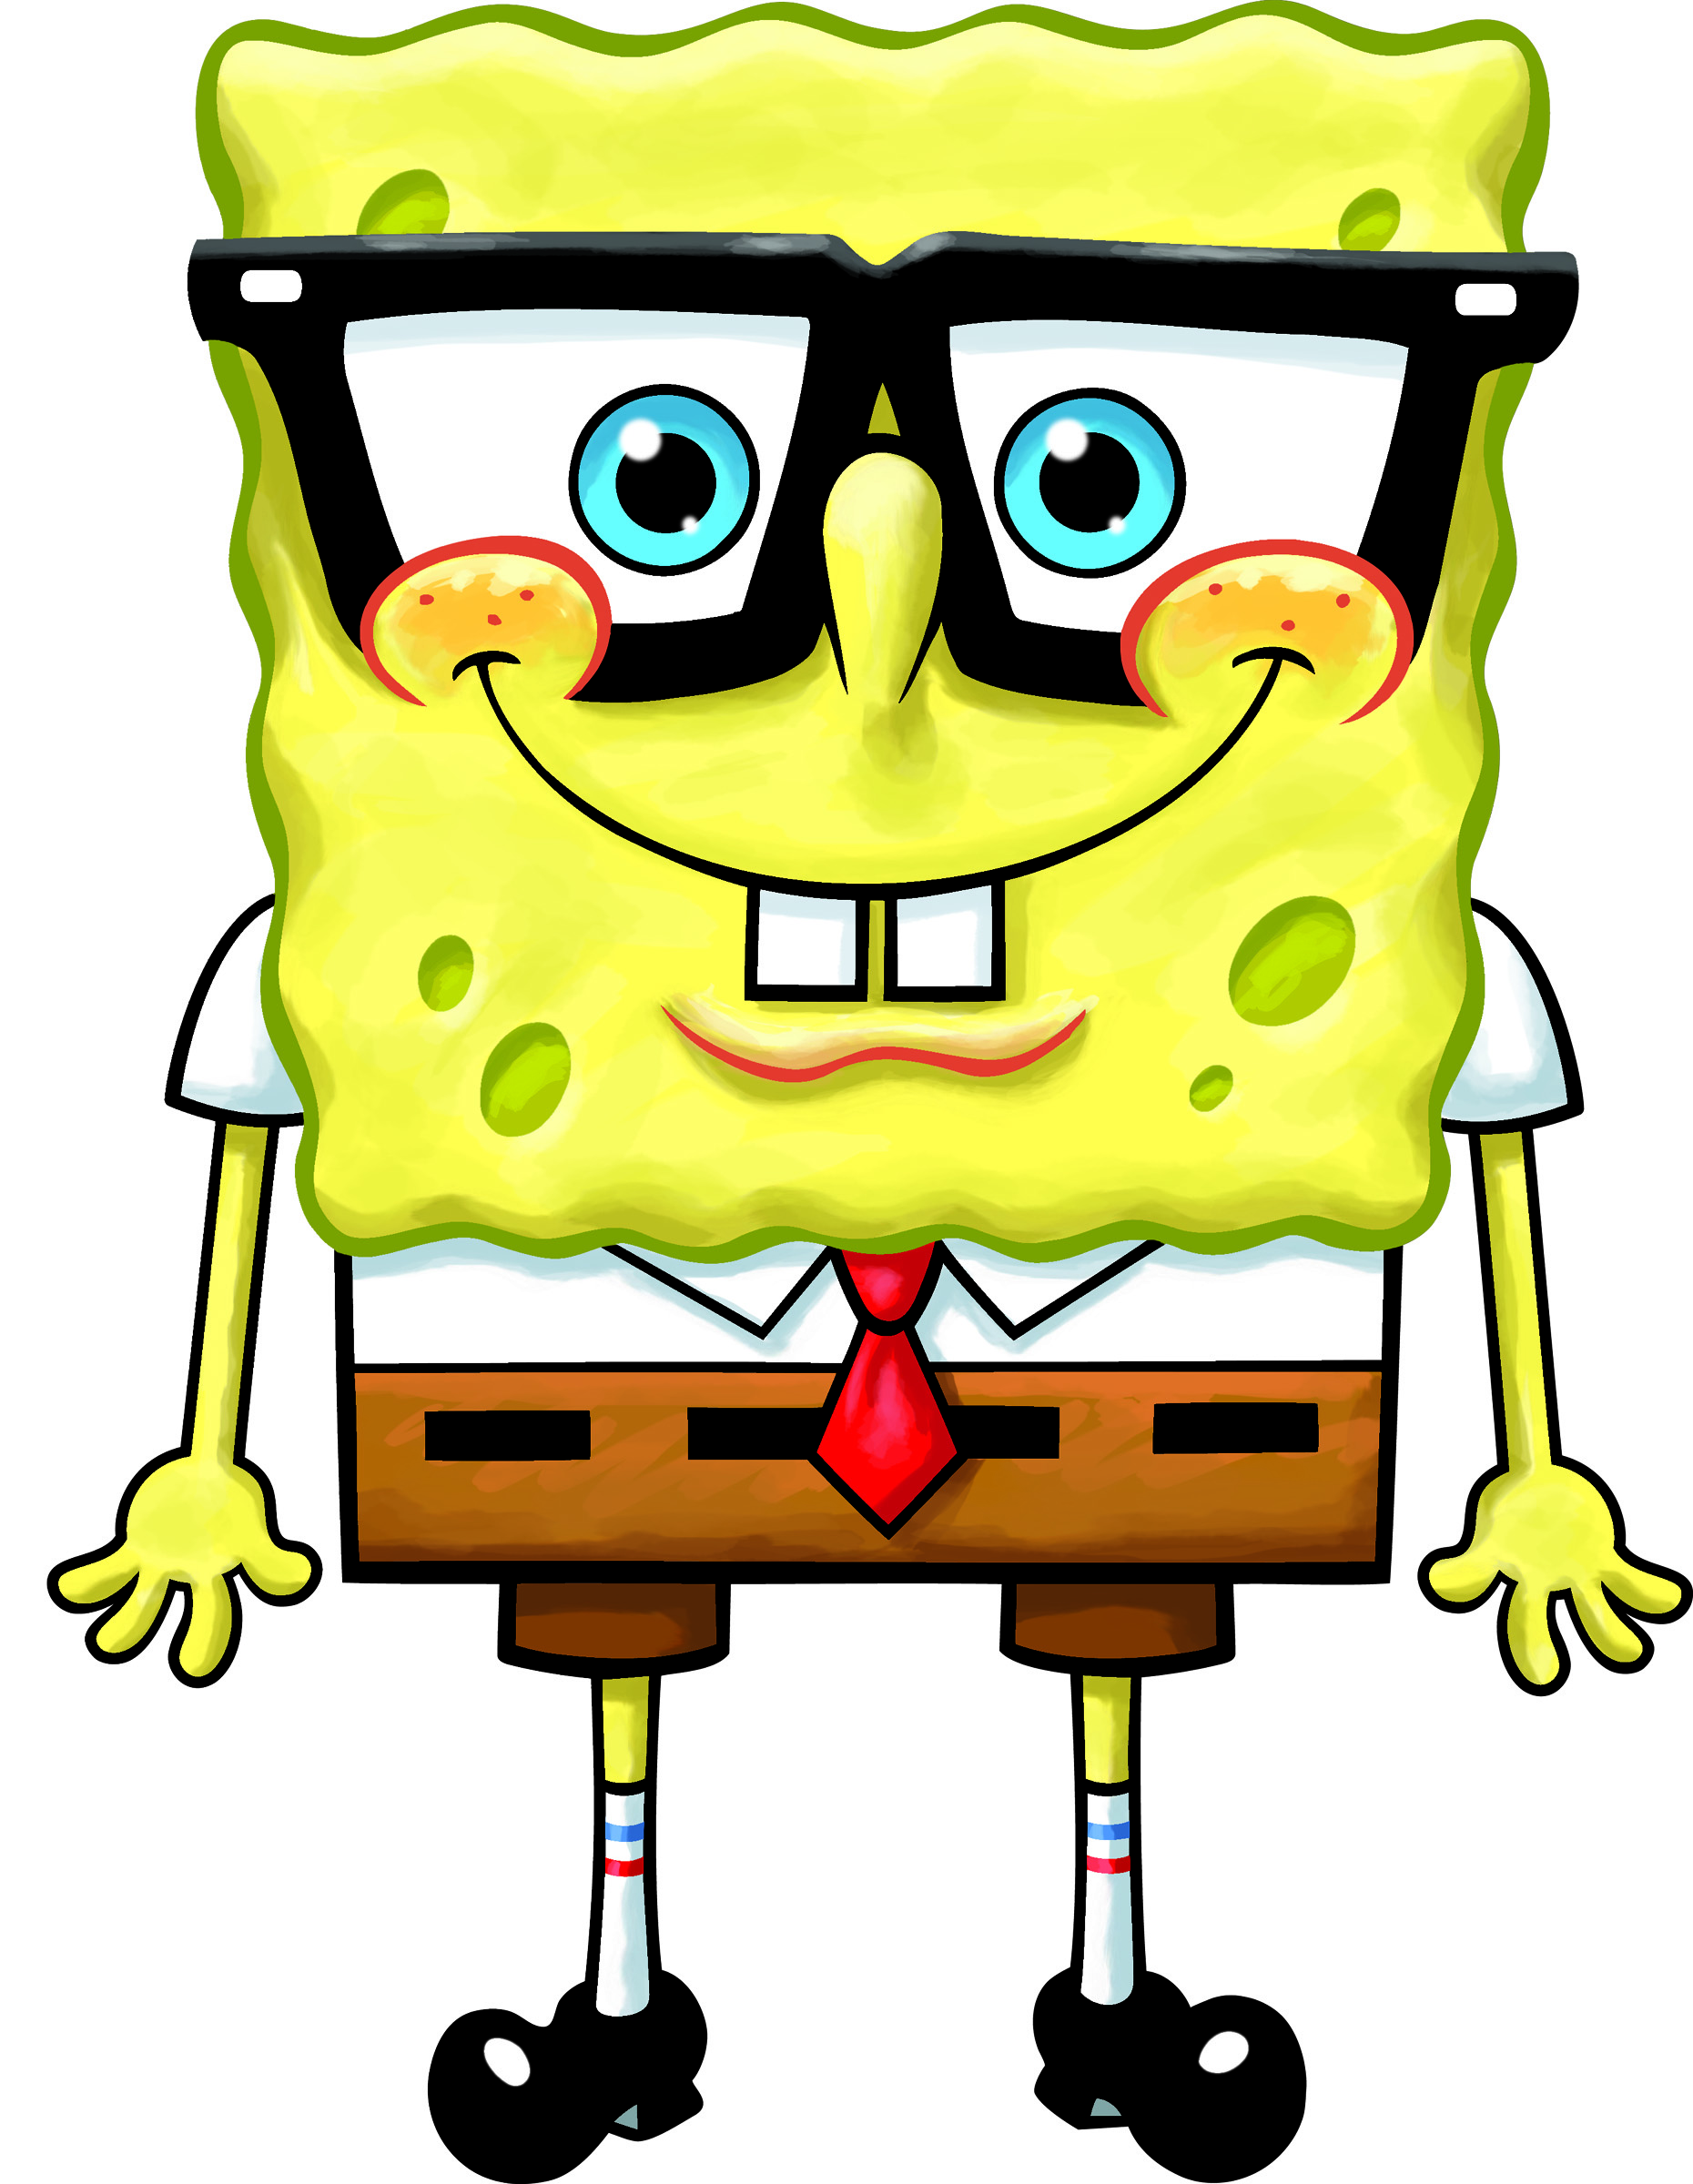 SpongeBob SquarePants  THE ADVENTURES OF GARY THE SNAIL Wiki